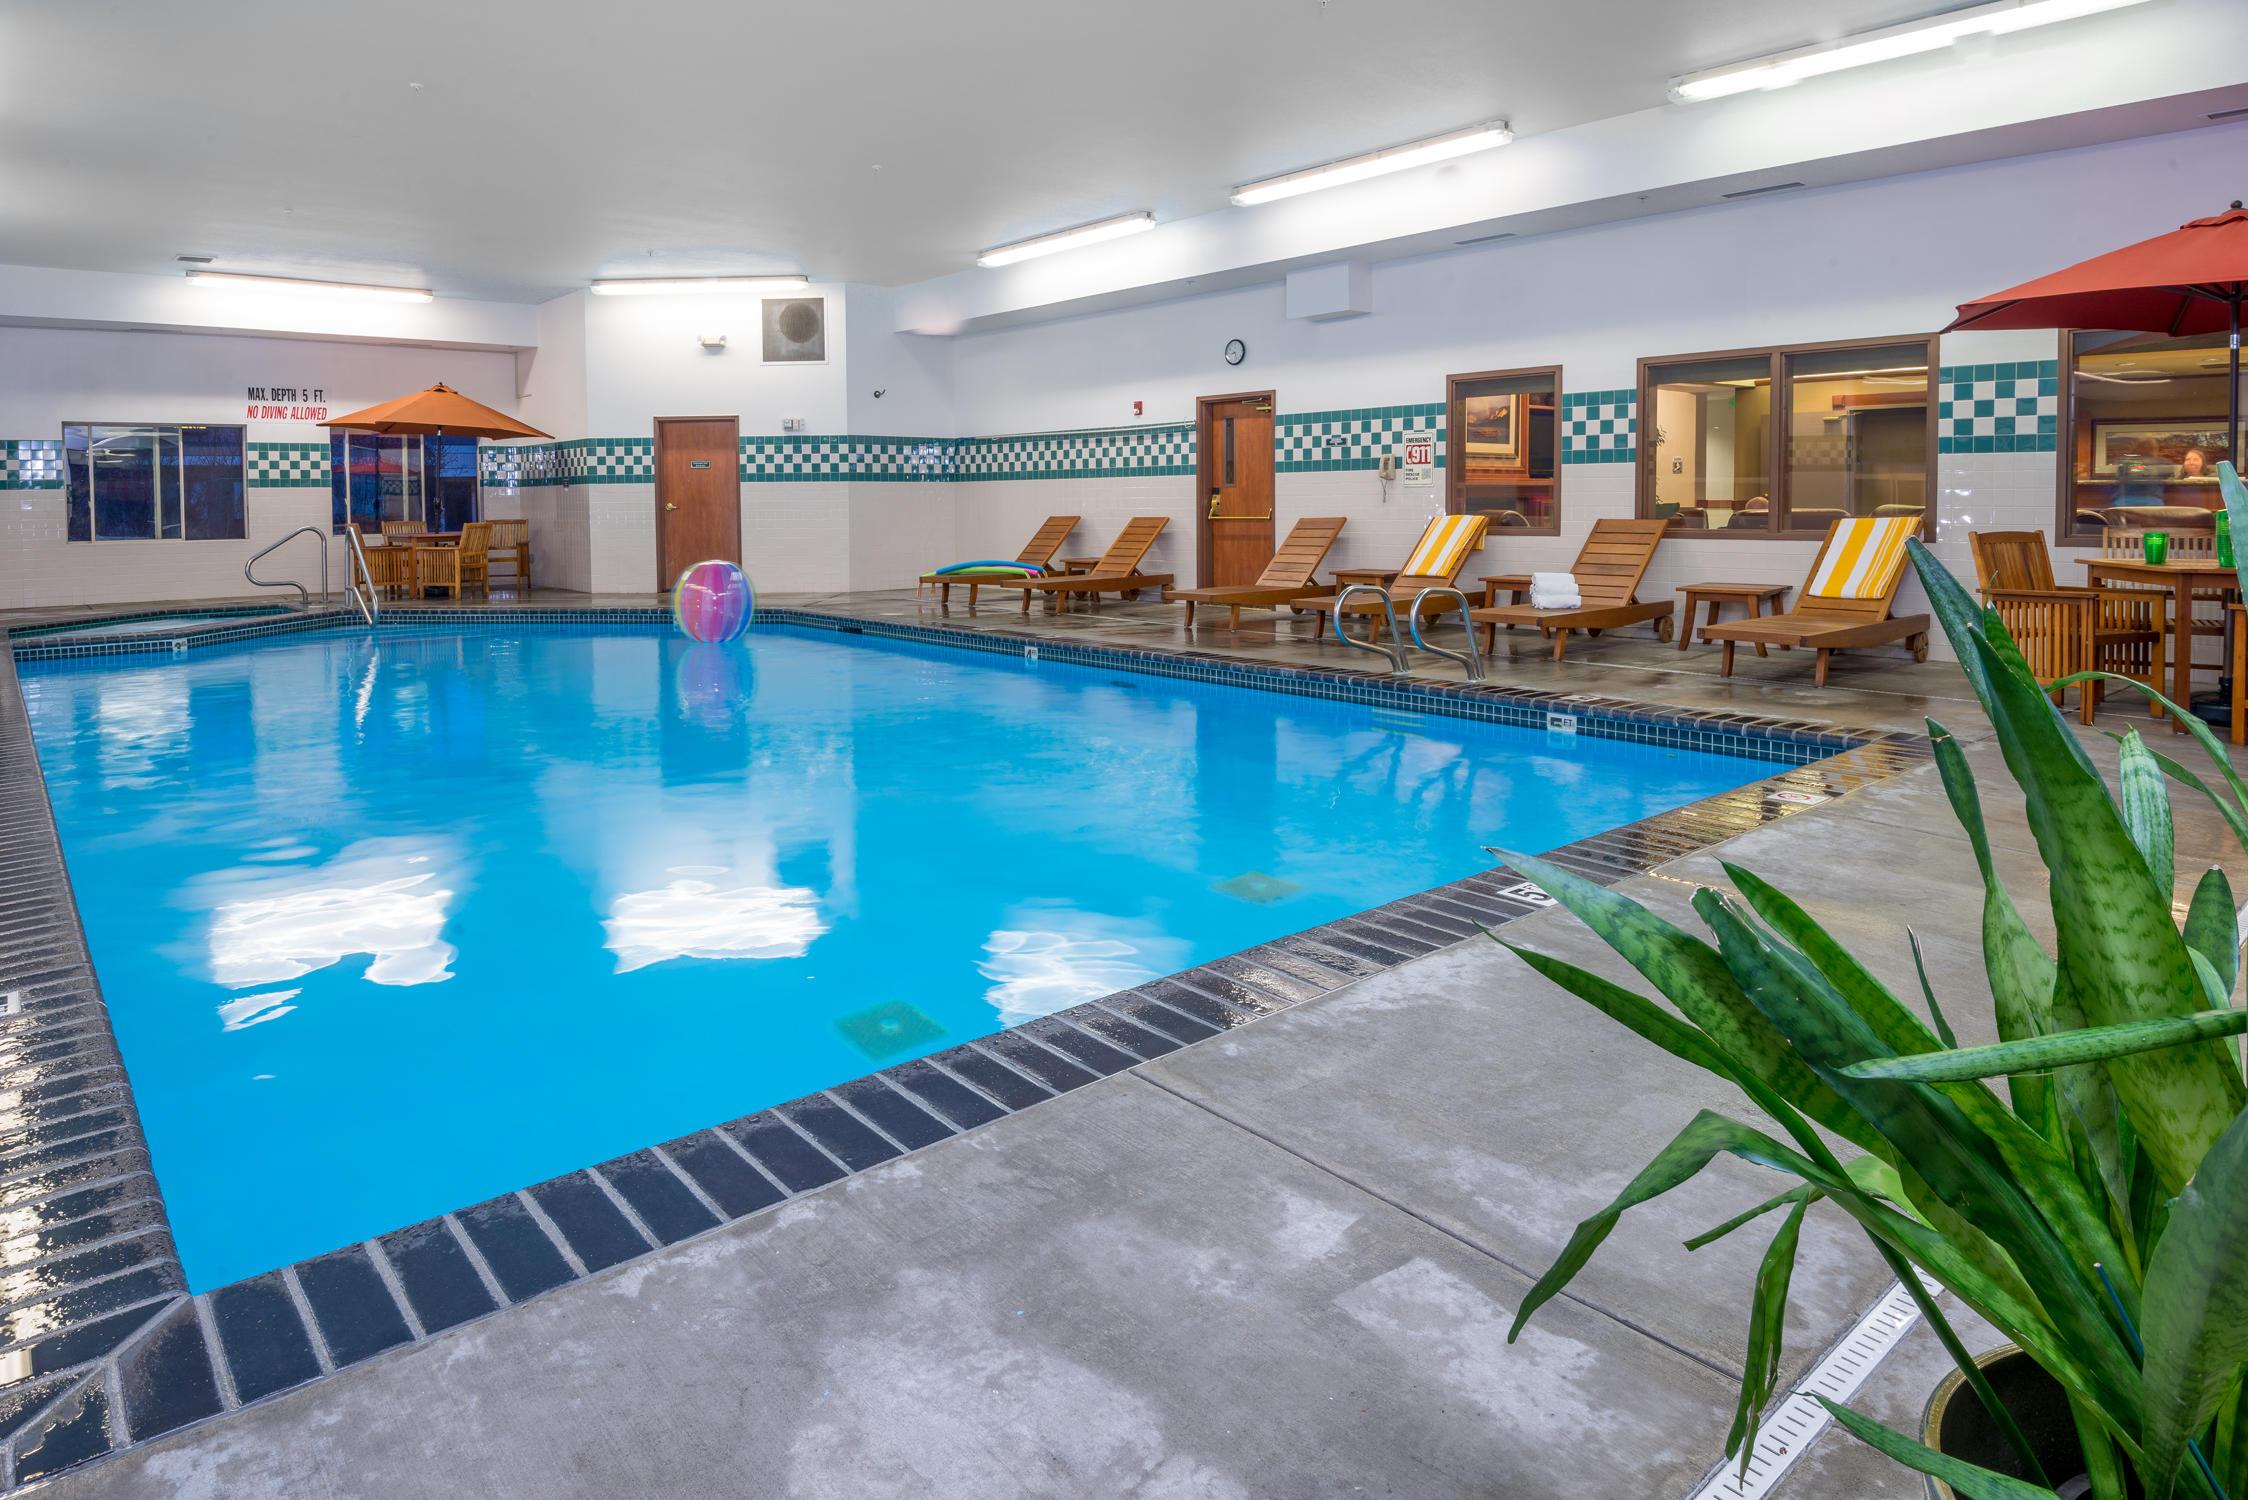 Wood River Inn & Suites image 4